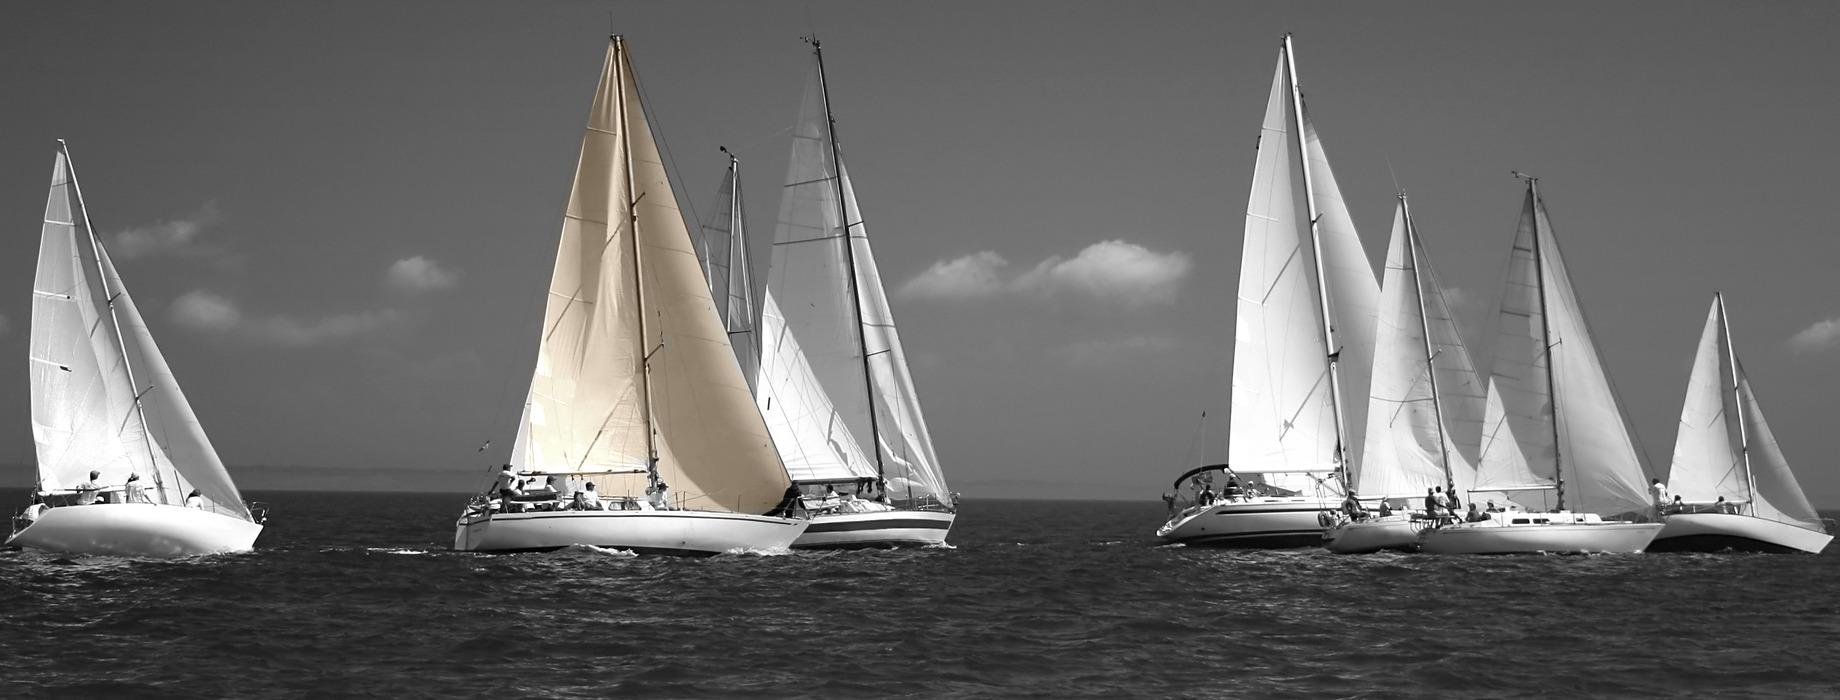 sailboats-1840x